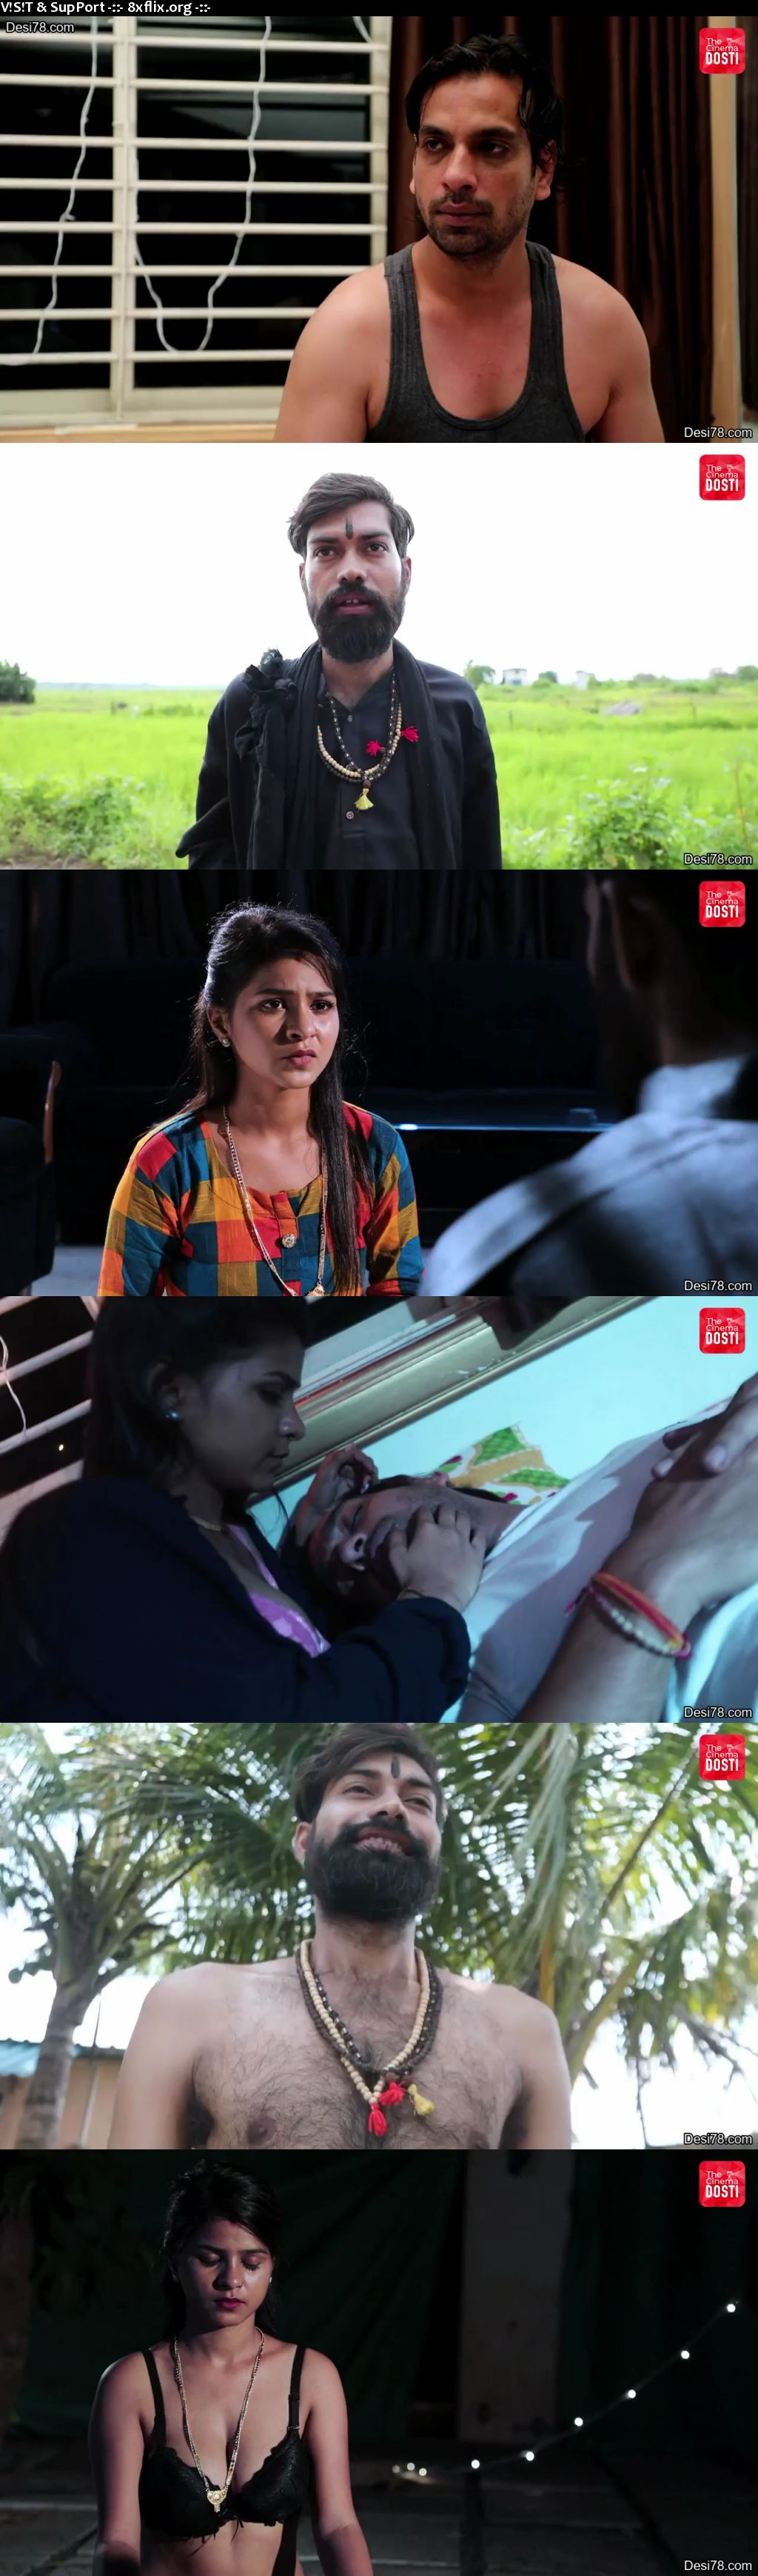 18+ Yoni Sadhna 2020 Full Hindi HOT Movie Download 720p HDRip